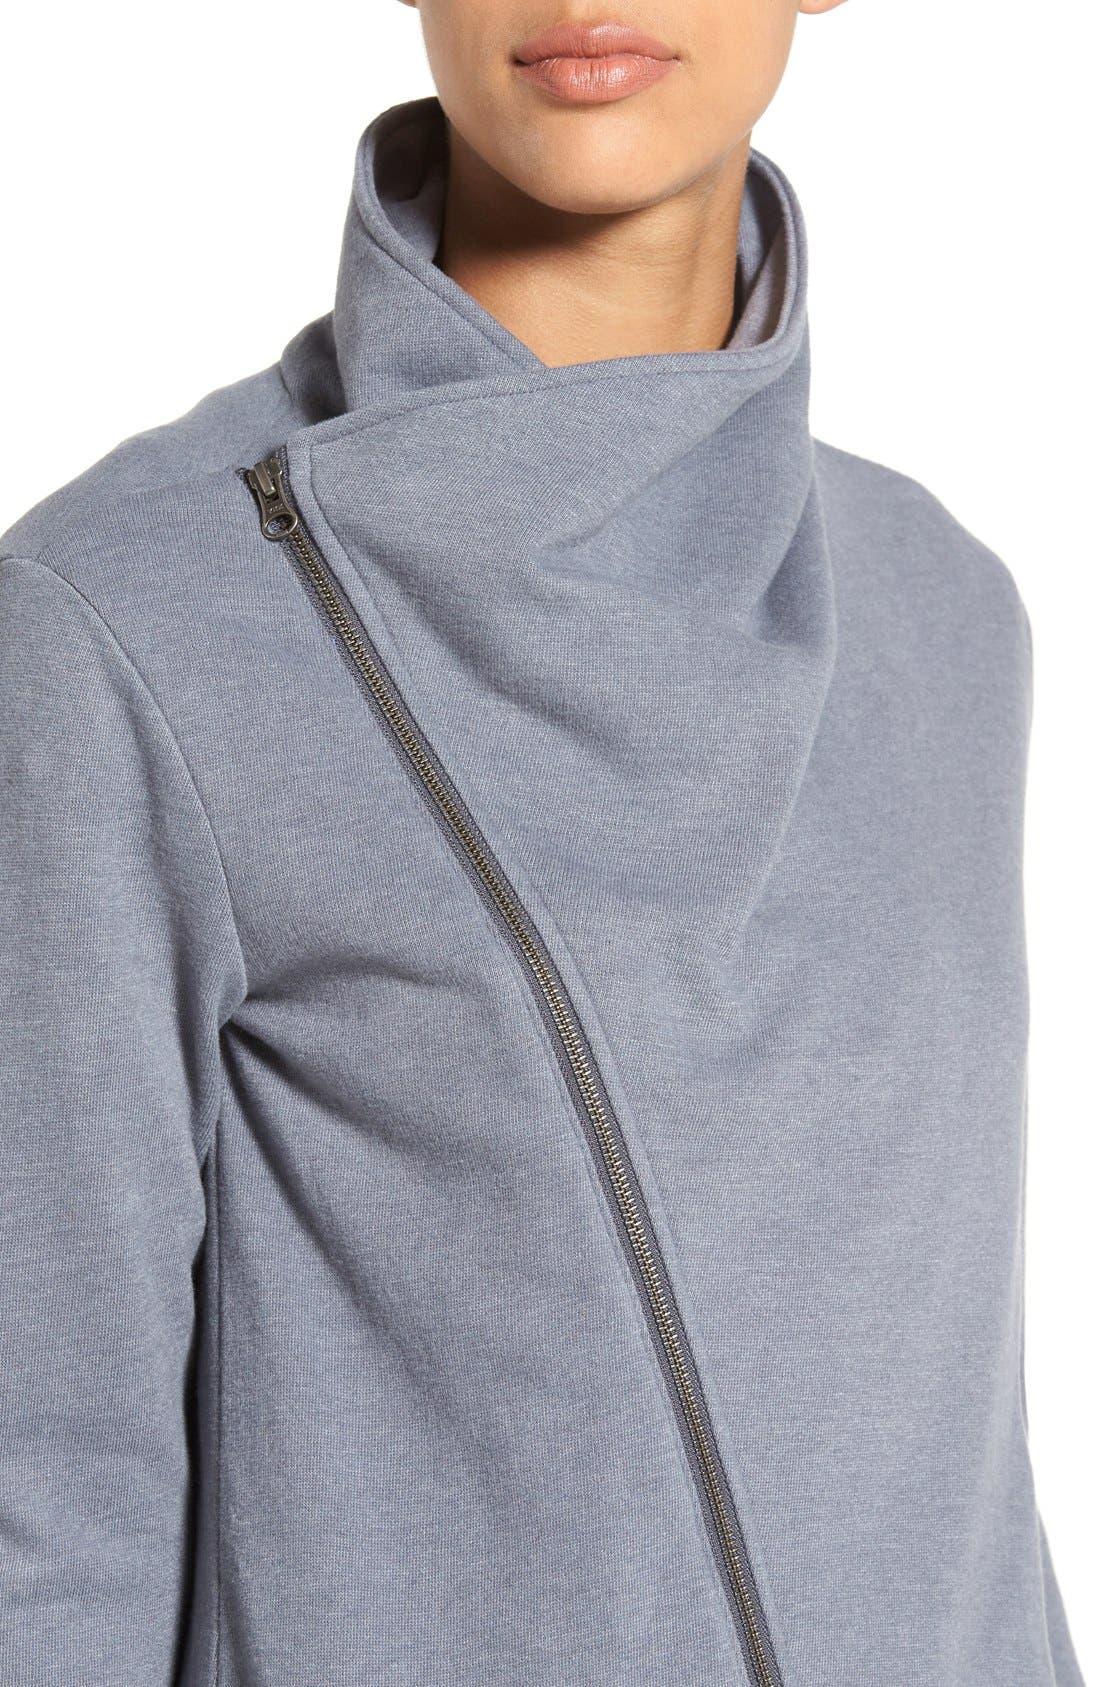 Asymmetrical Drape Collar Terry Jacket,                             Alternate thumbnail 10, color,                             GREY